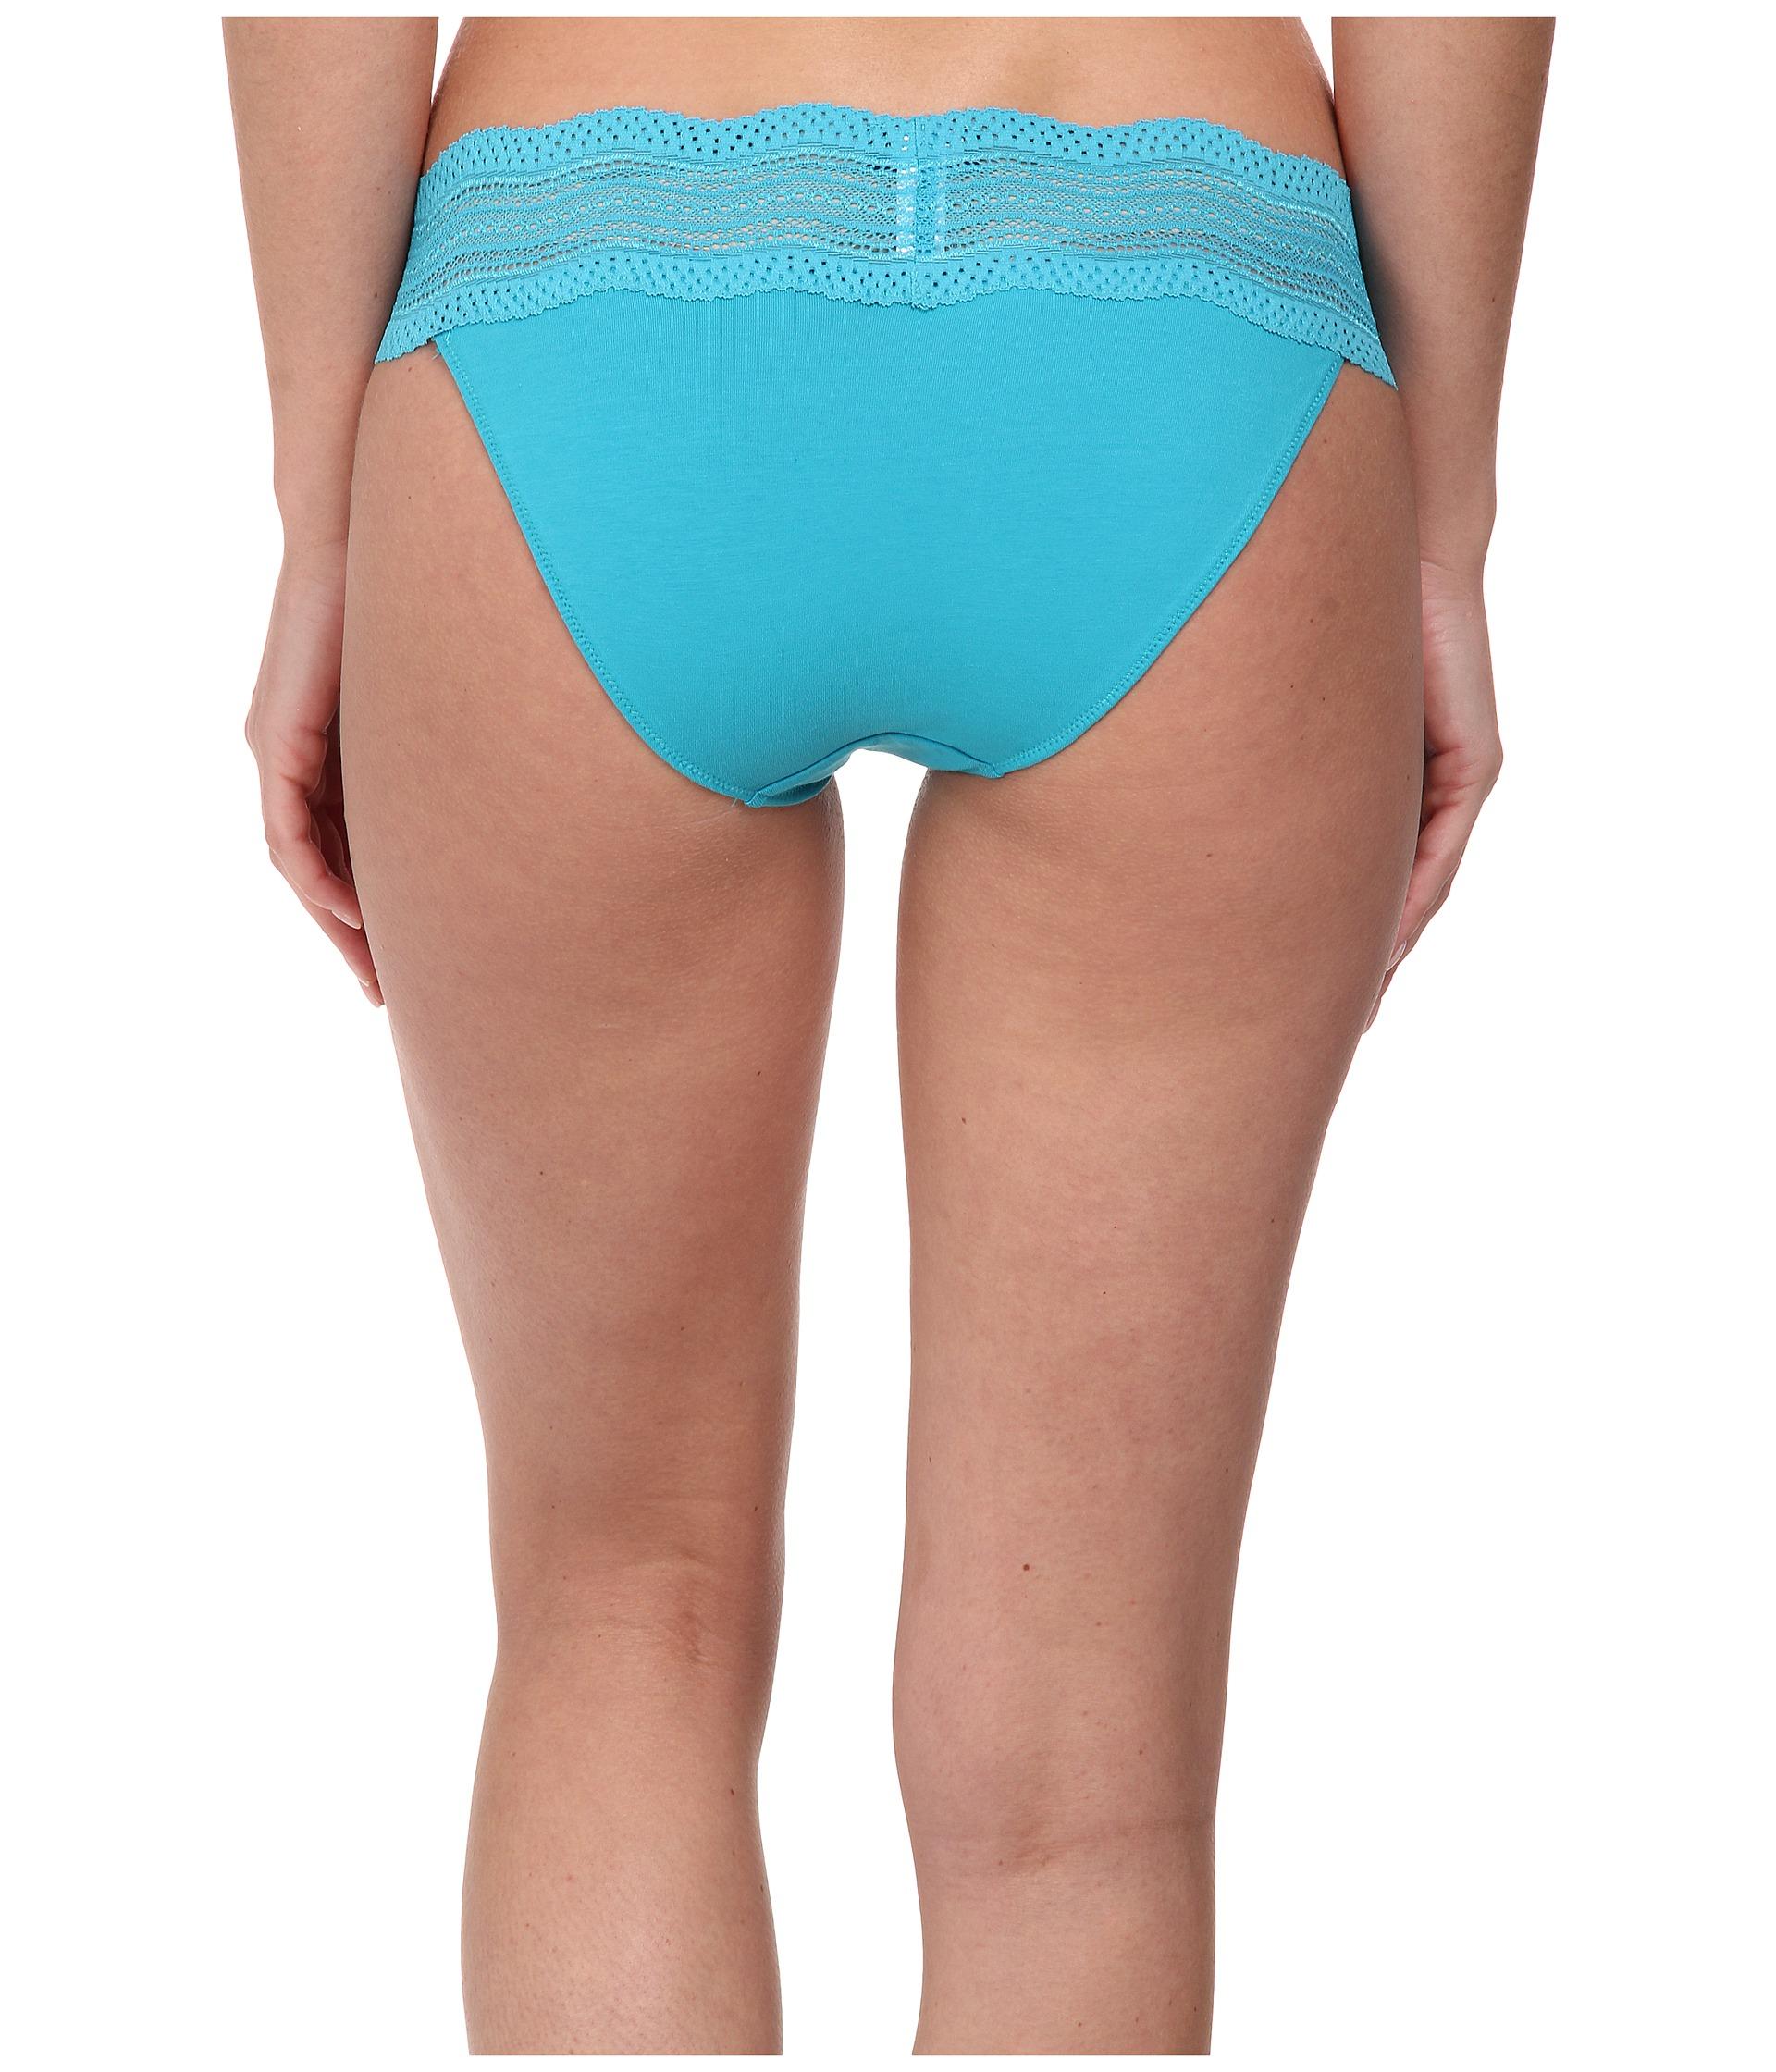 cosabella dolce lowrider bikini babylon blue   zappos   free shipping both ways